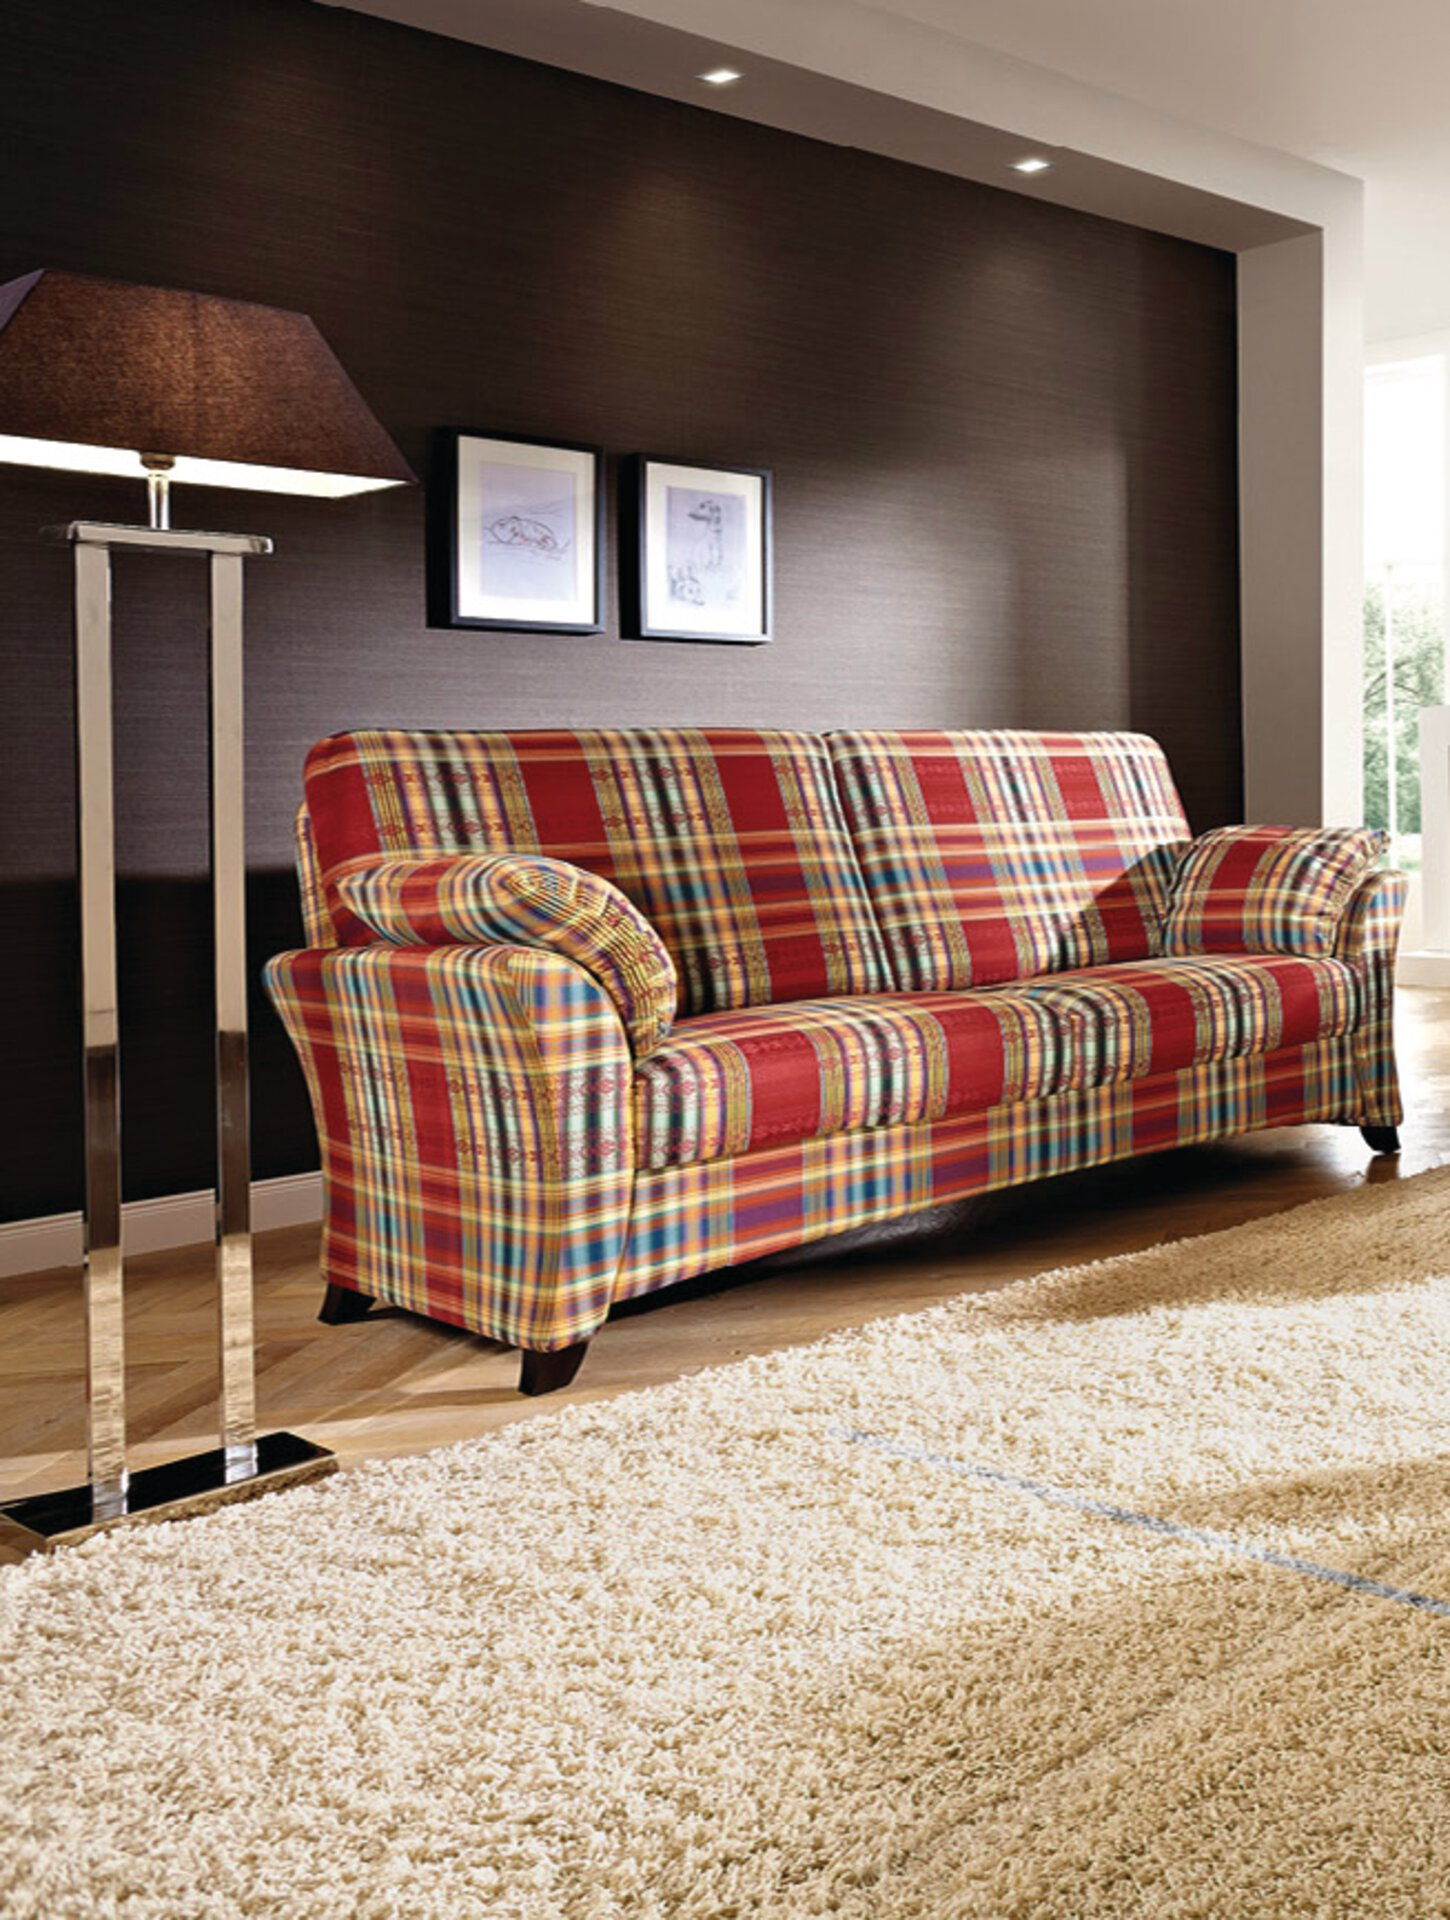 Sofa 3-Sitzer SYDNEY Schröno Textil mehrfarbig 93 x 91 x 196 cm